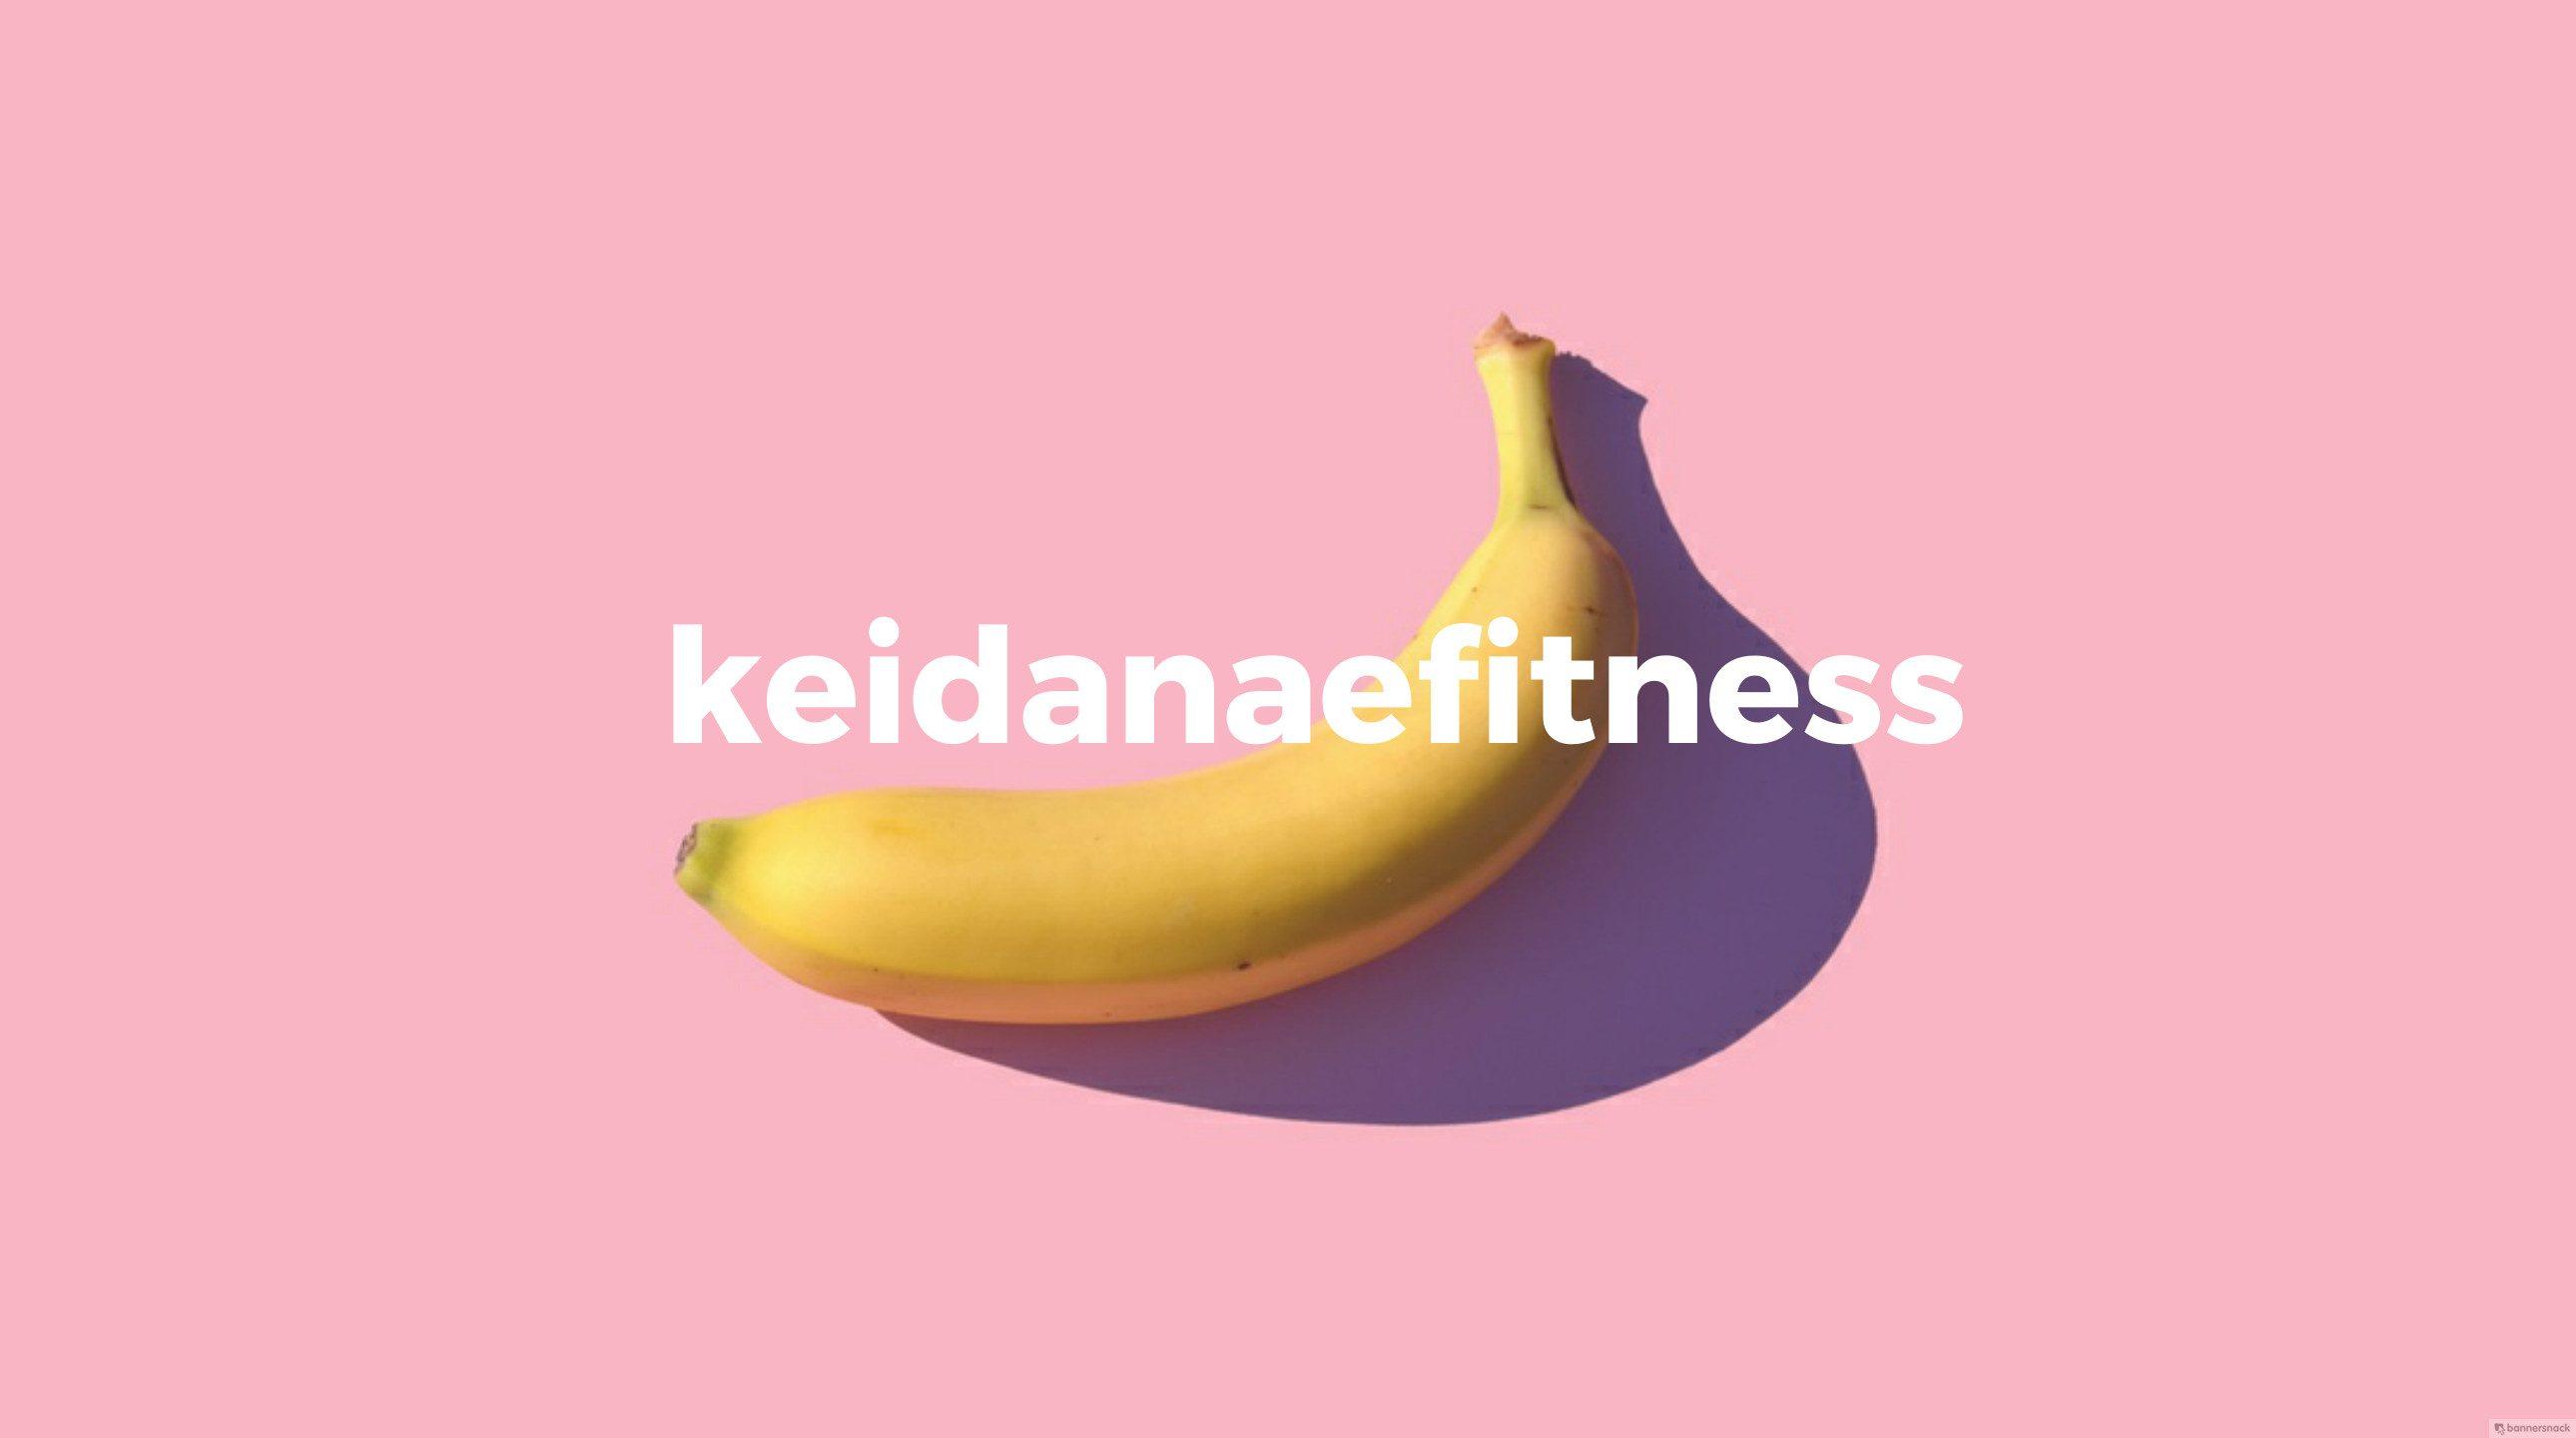 keidanaefitness